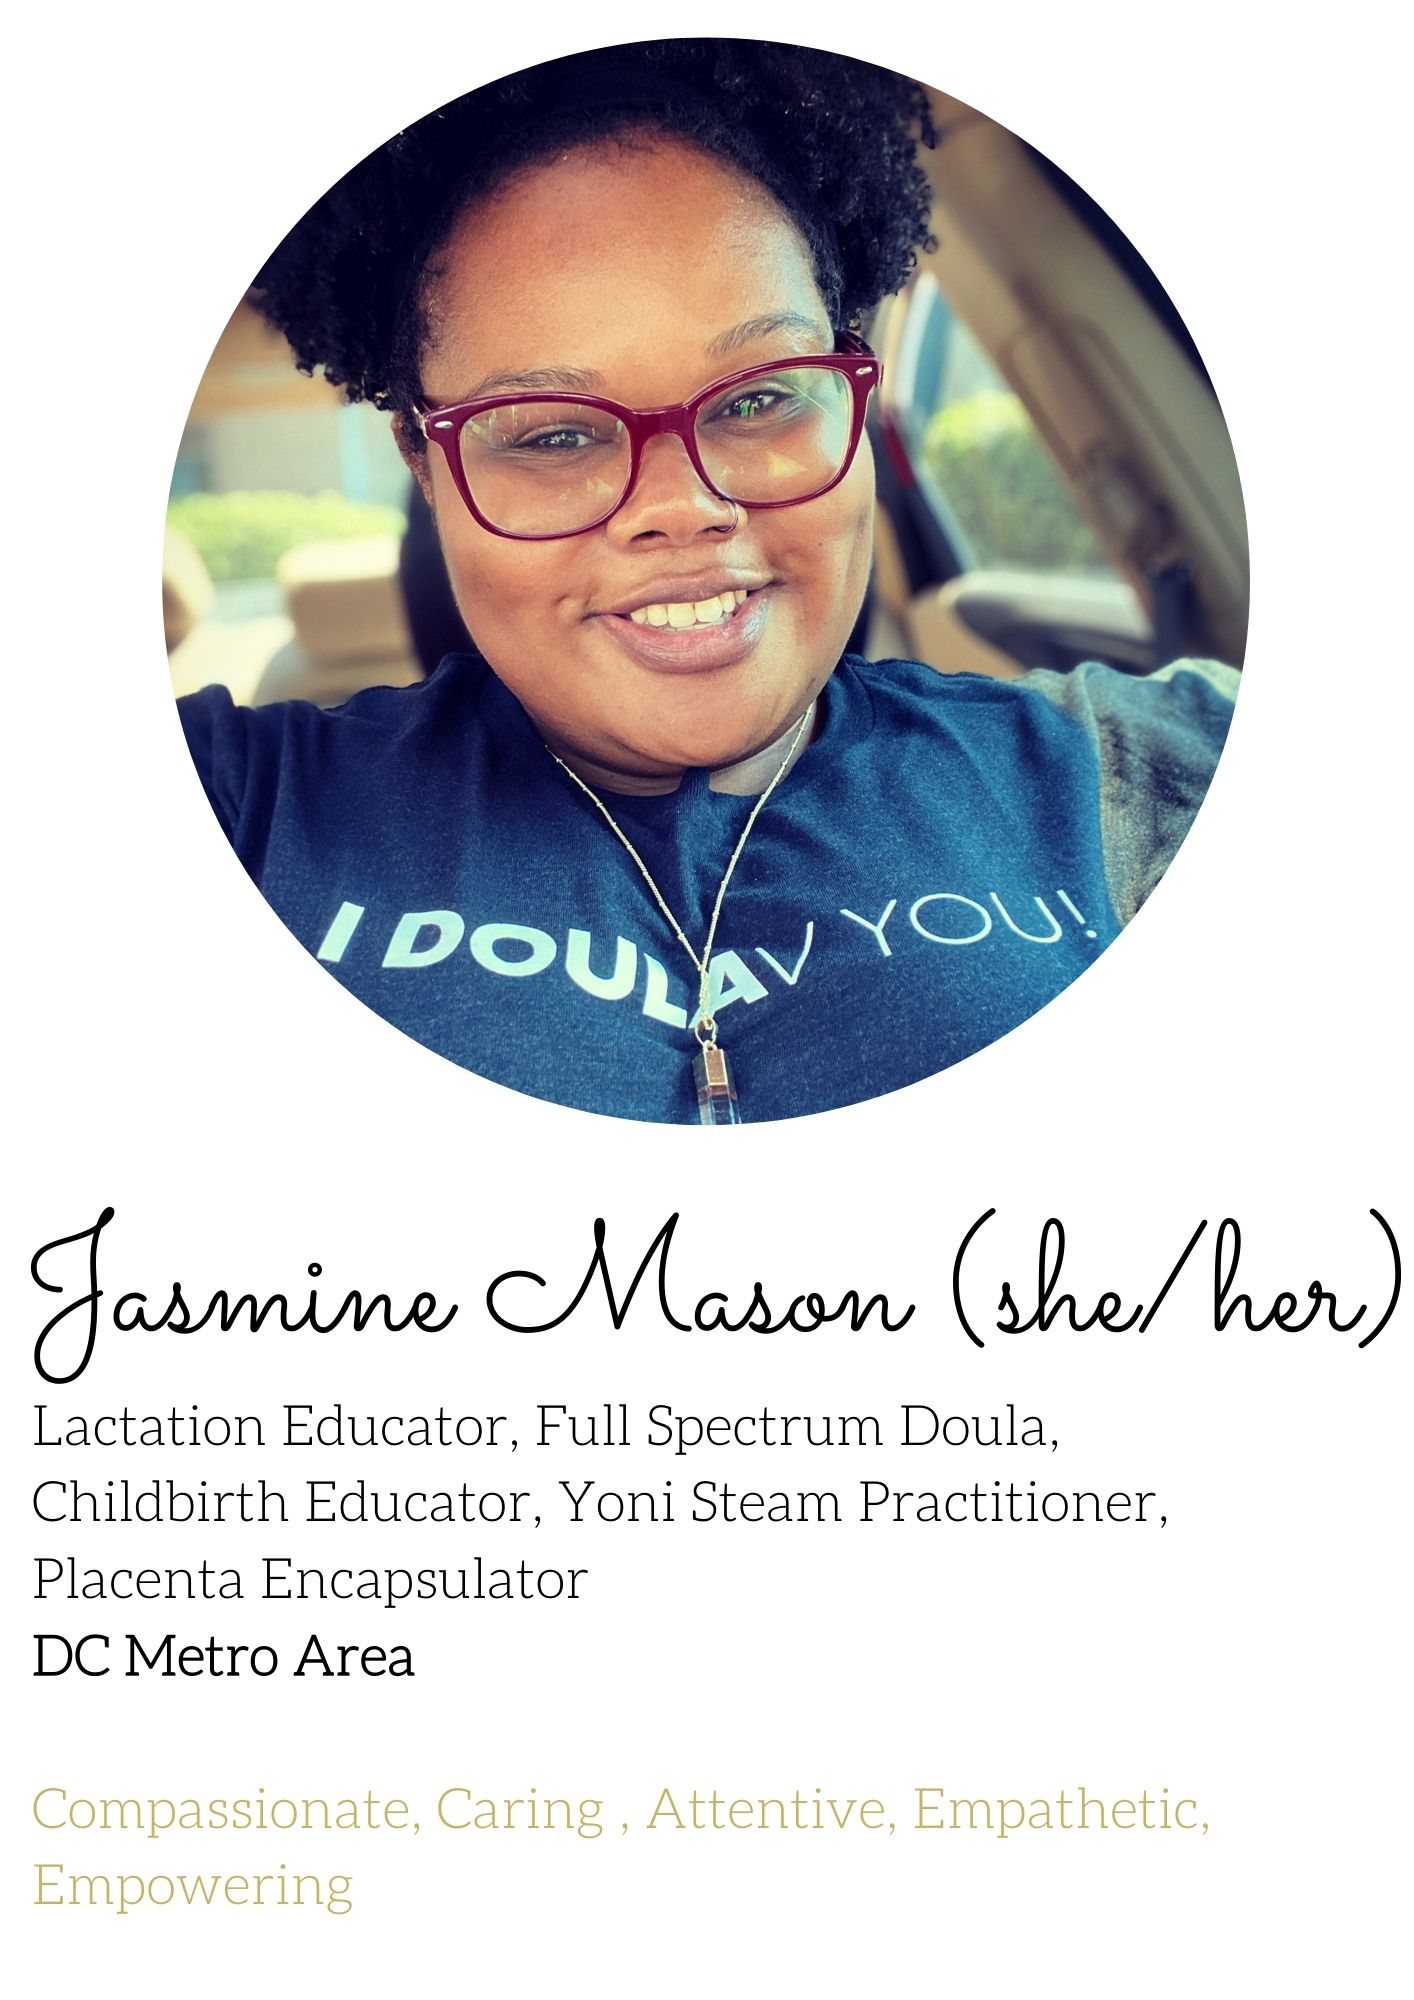 Jasmine Mason she/her lactation educator, full spectrum doula, childbirth educator, yoni steam practitioner, placenta encapsulator dc metro area, compassionate, caring, attentive, empathetic, empowering